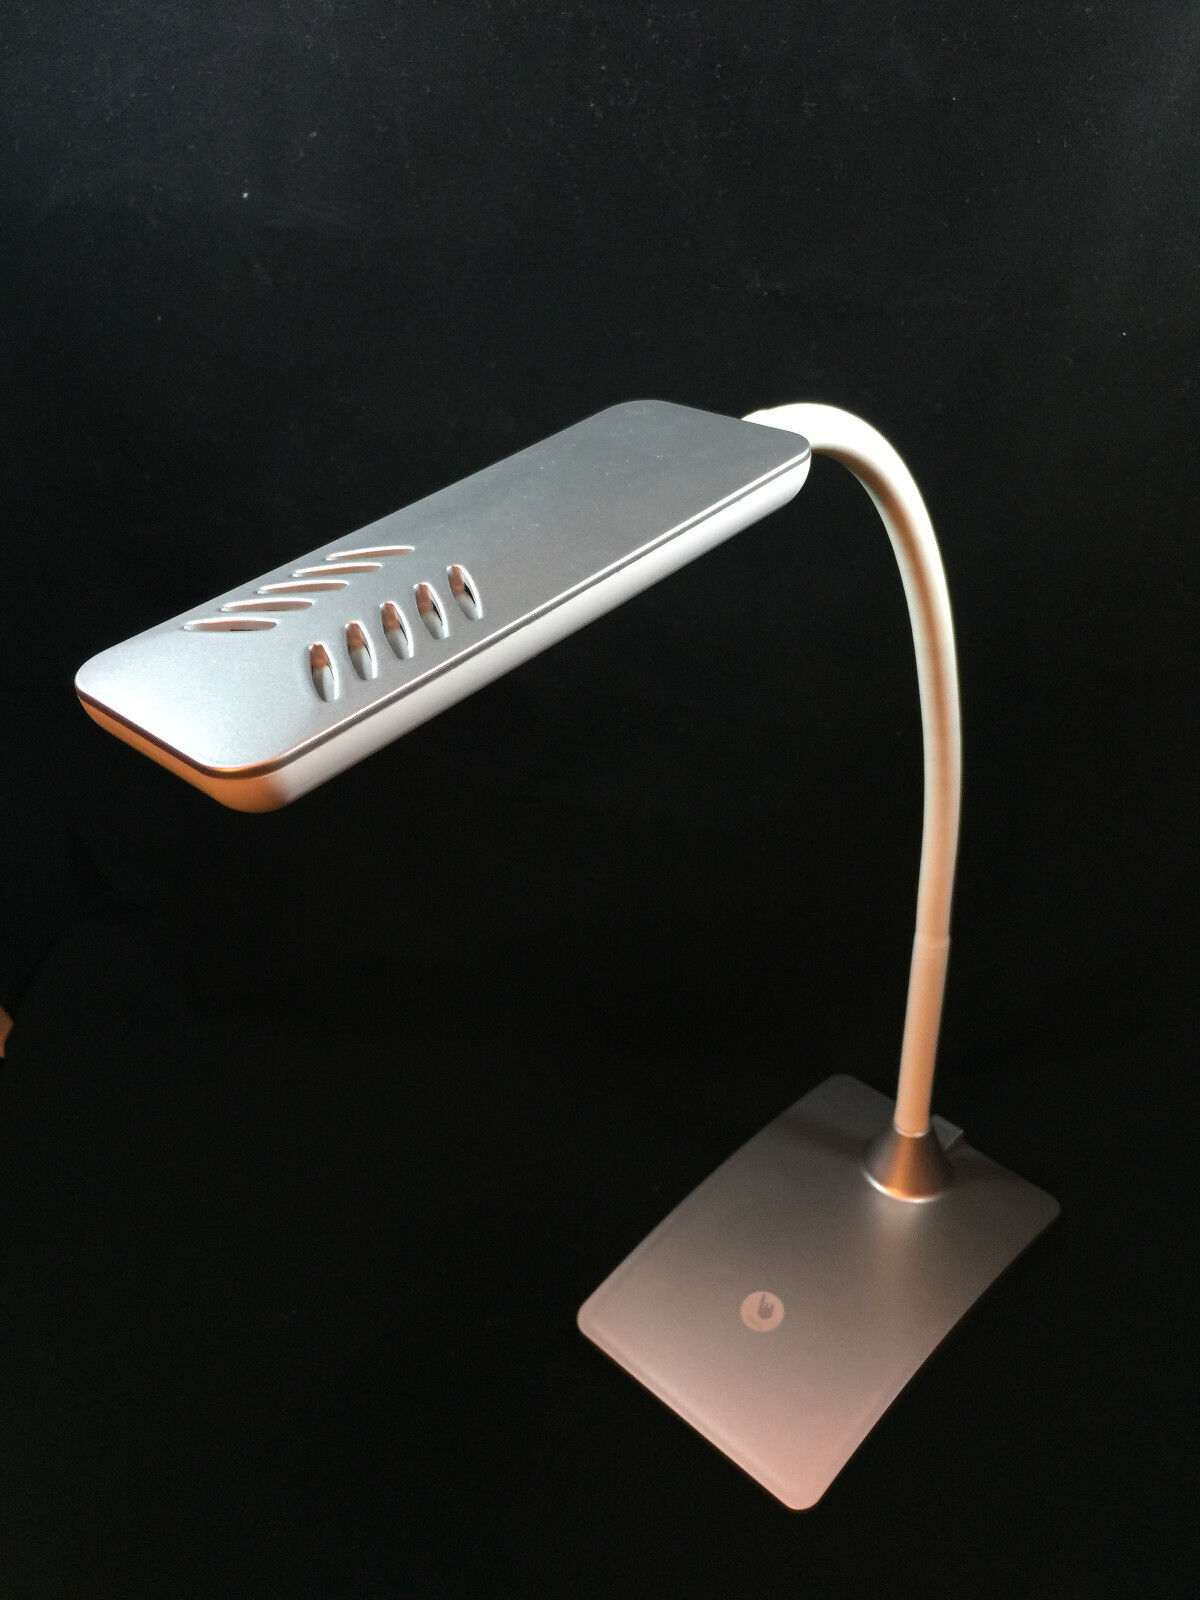 7W Dimmable Touch Sensor Adjustable 12 LED Light Desk Table